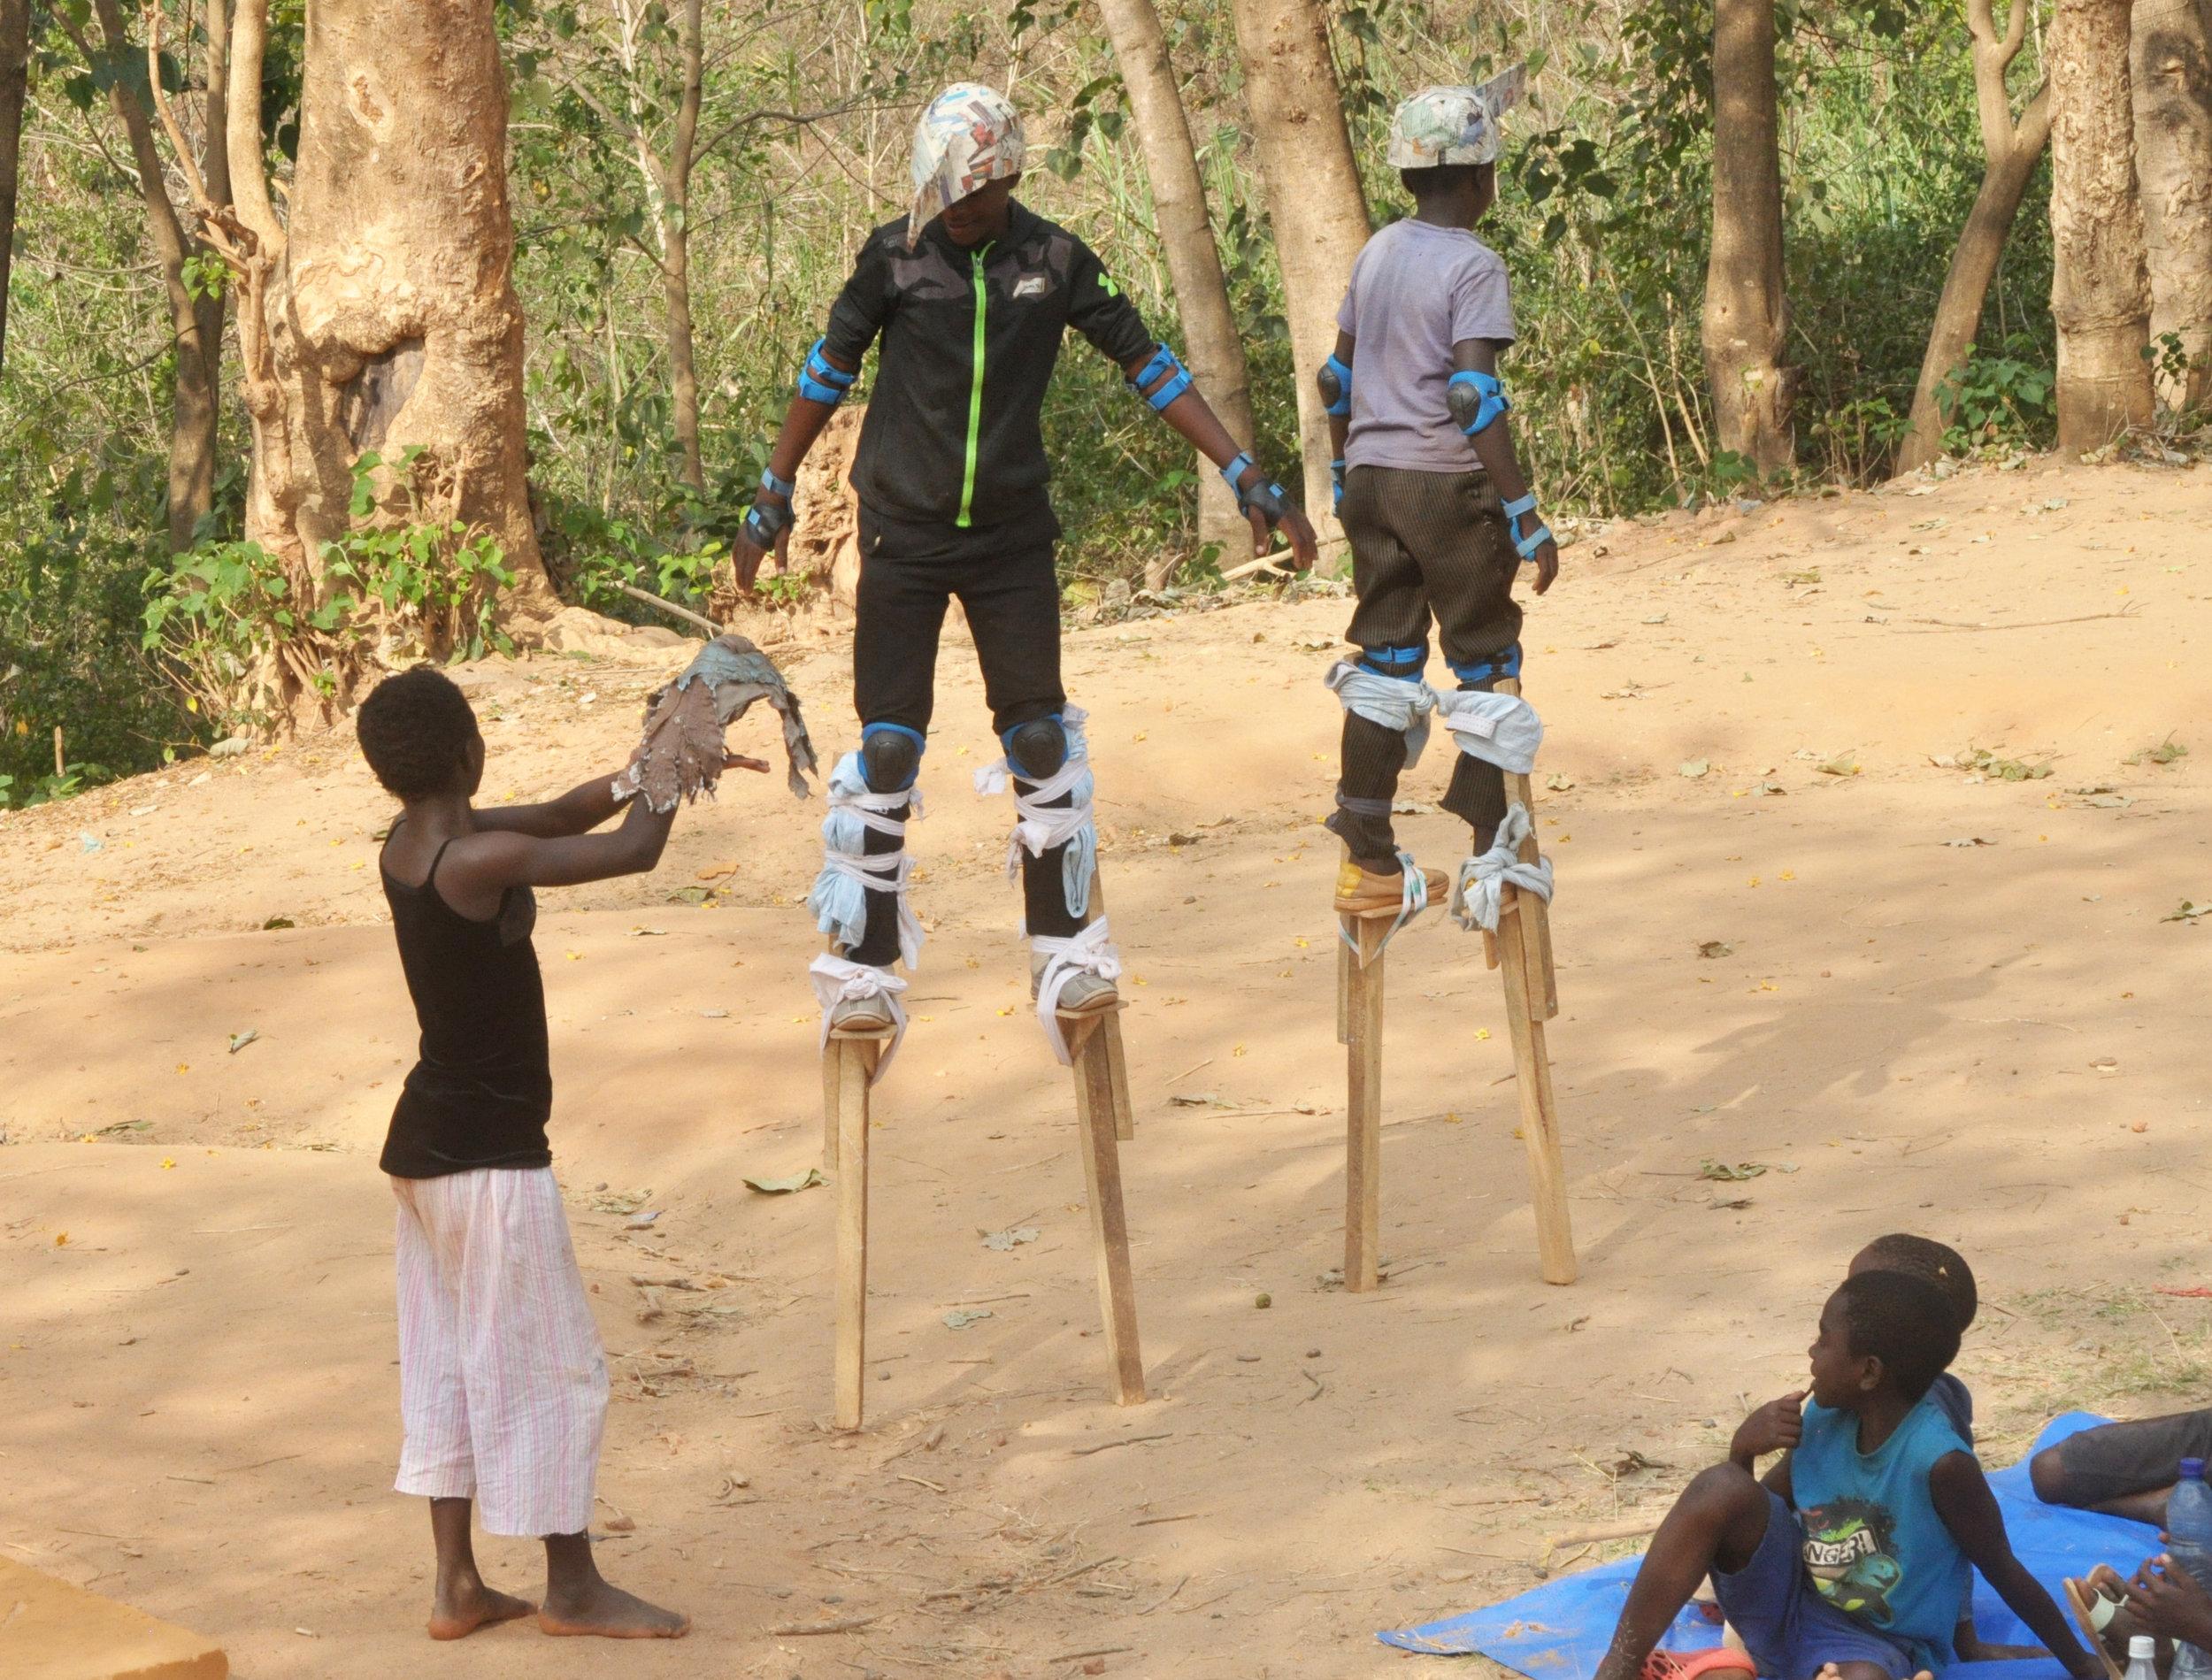 stilt practice Kalambwe - with cuckoo.JPG